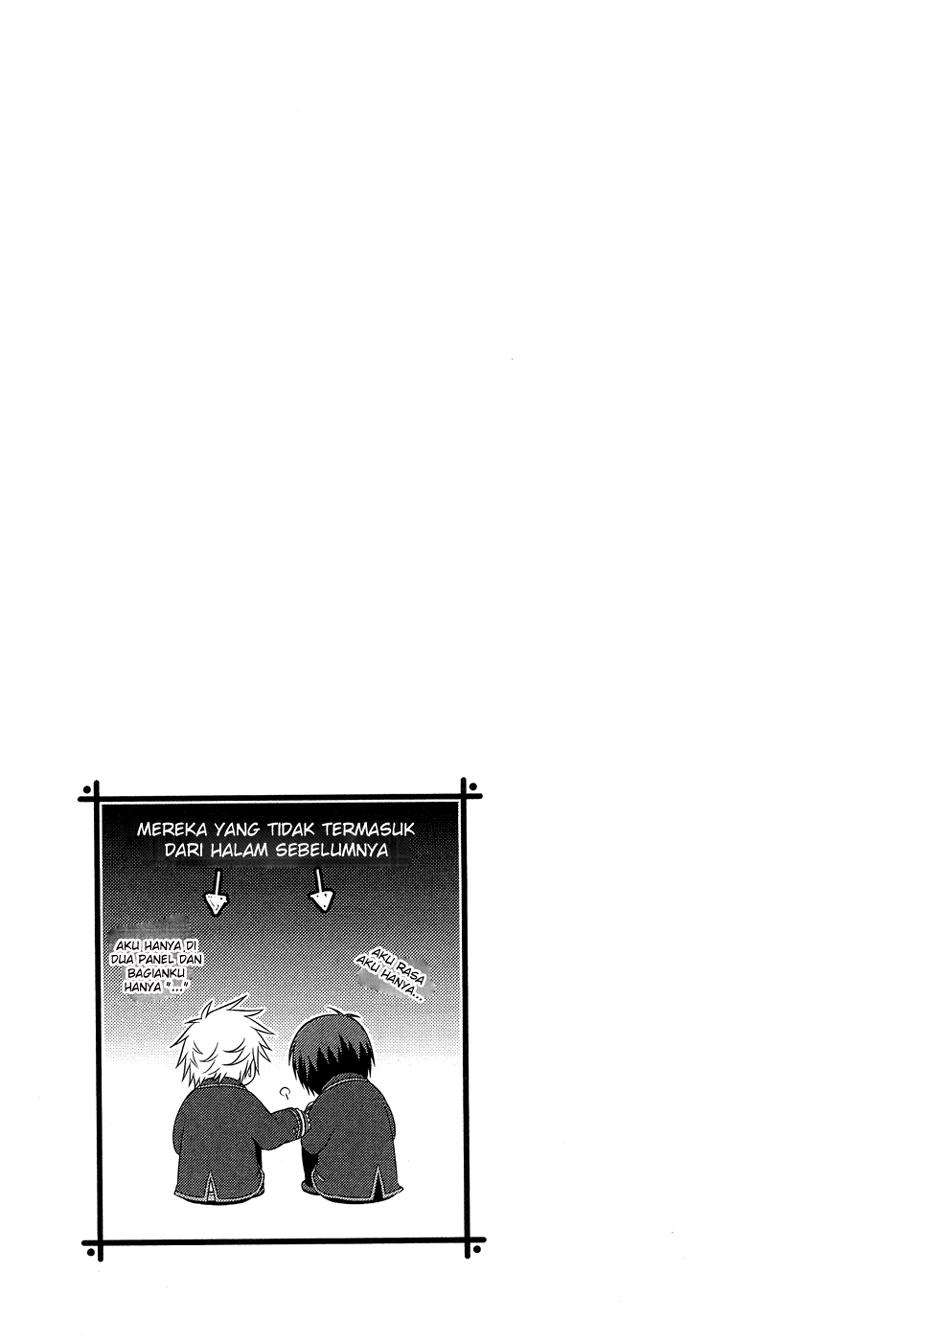 Komik iris zero 011 12 Indonesia iris zero 011 Terbaru 32 Baca Manga Komik Indonesia 